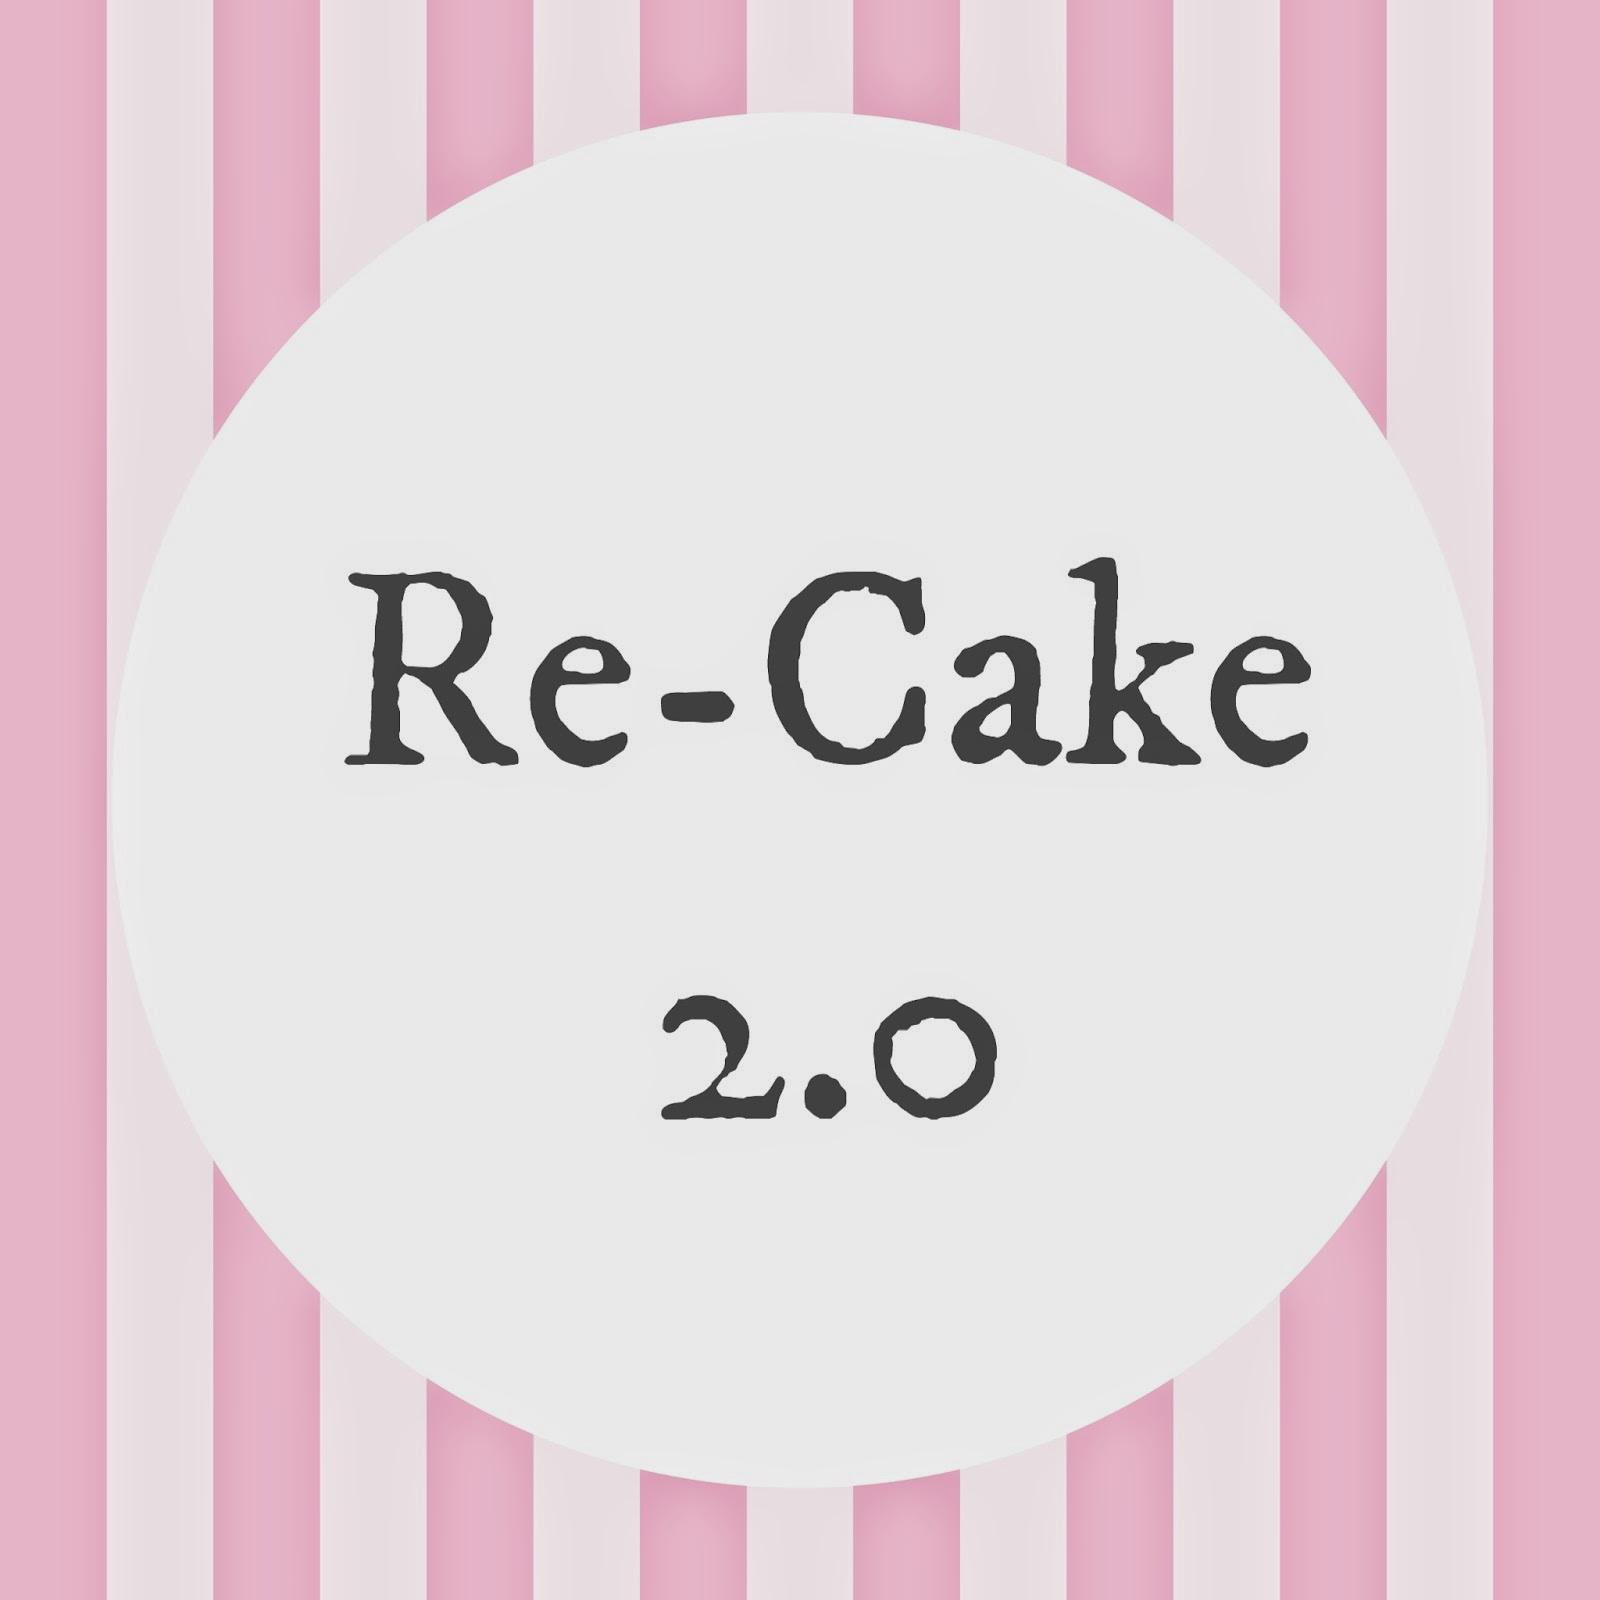 ReCake 2.0